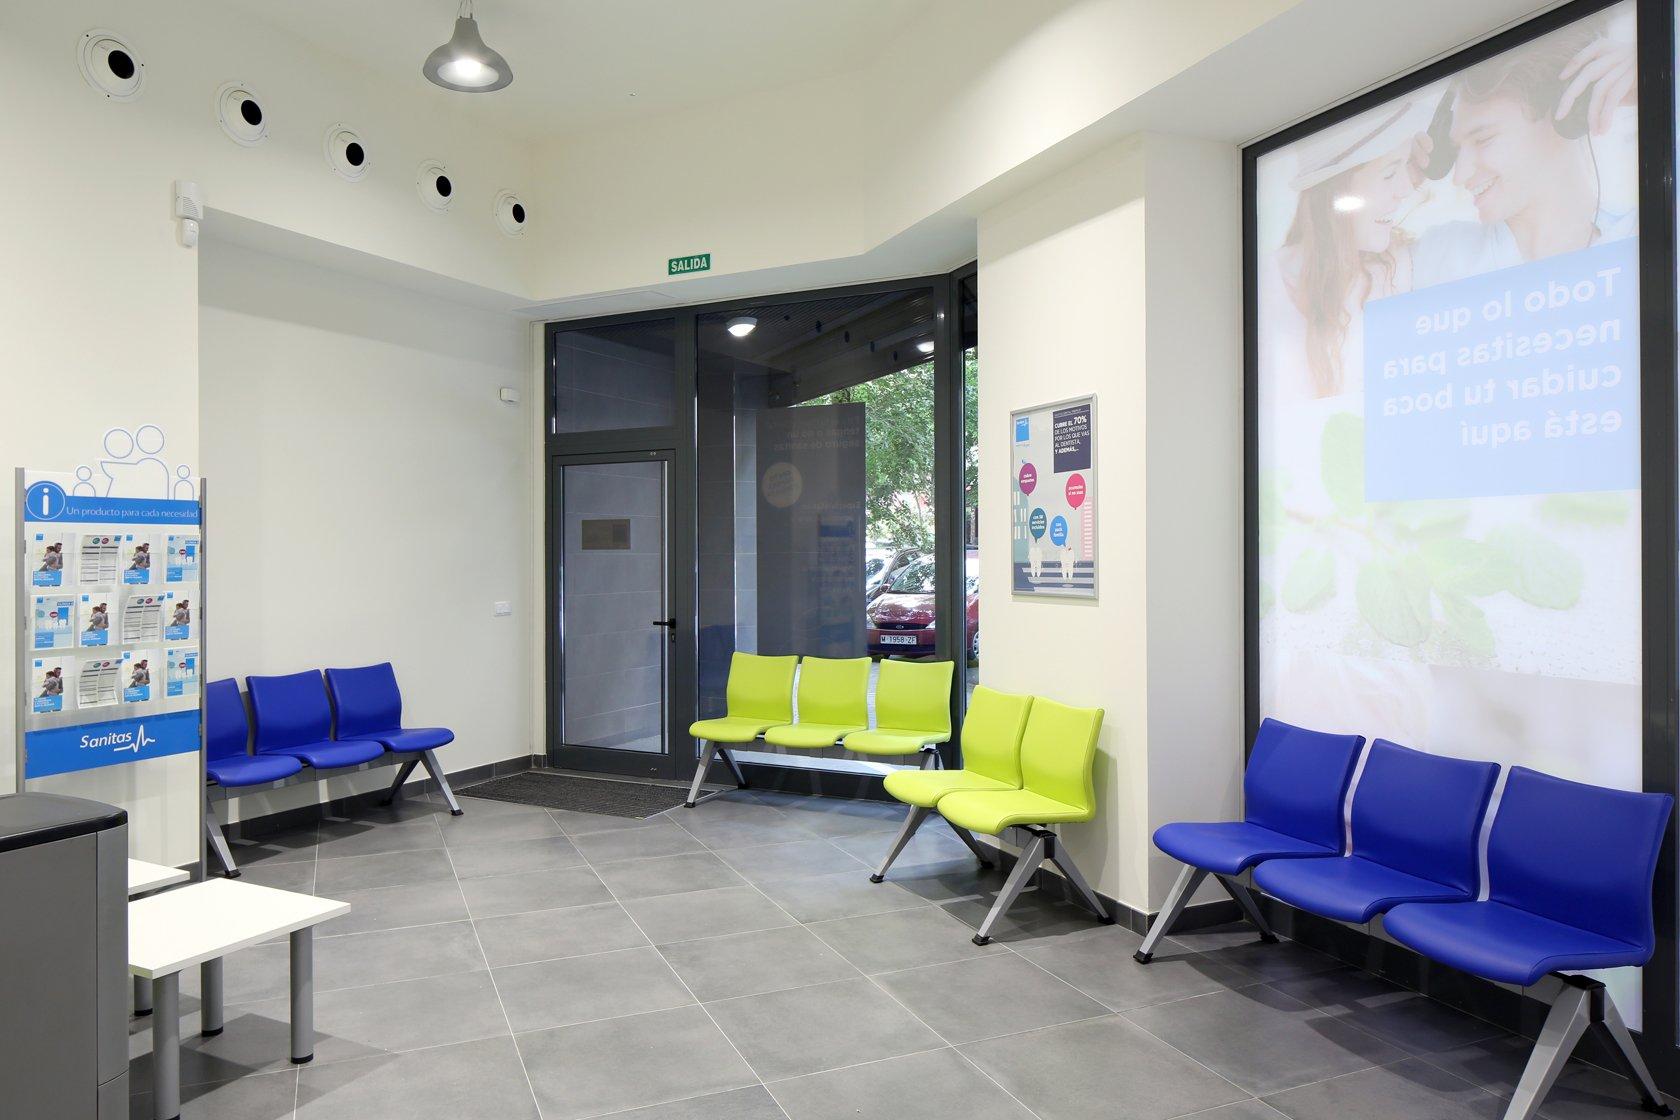 Clinica dental gaztambide dentistas en chamber for Oficinas centrales sanitas madrid